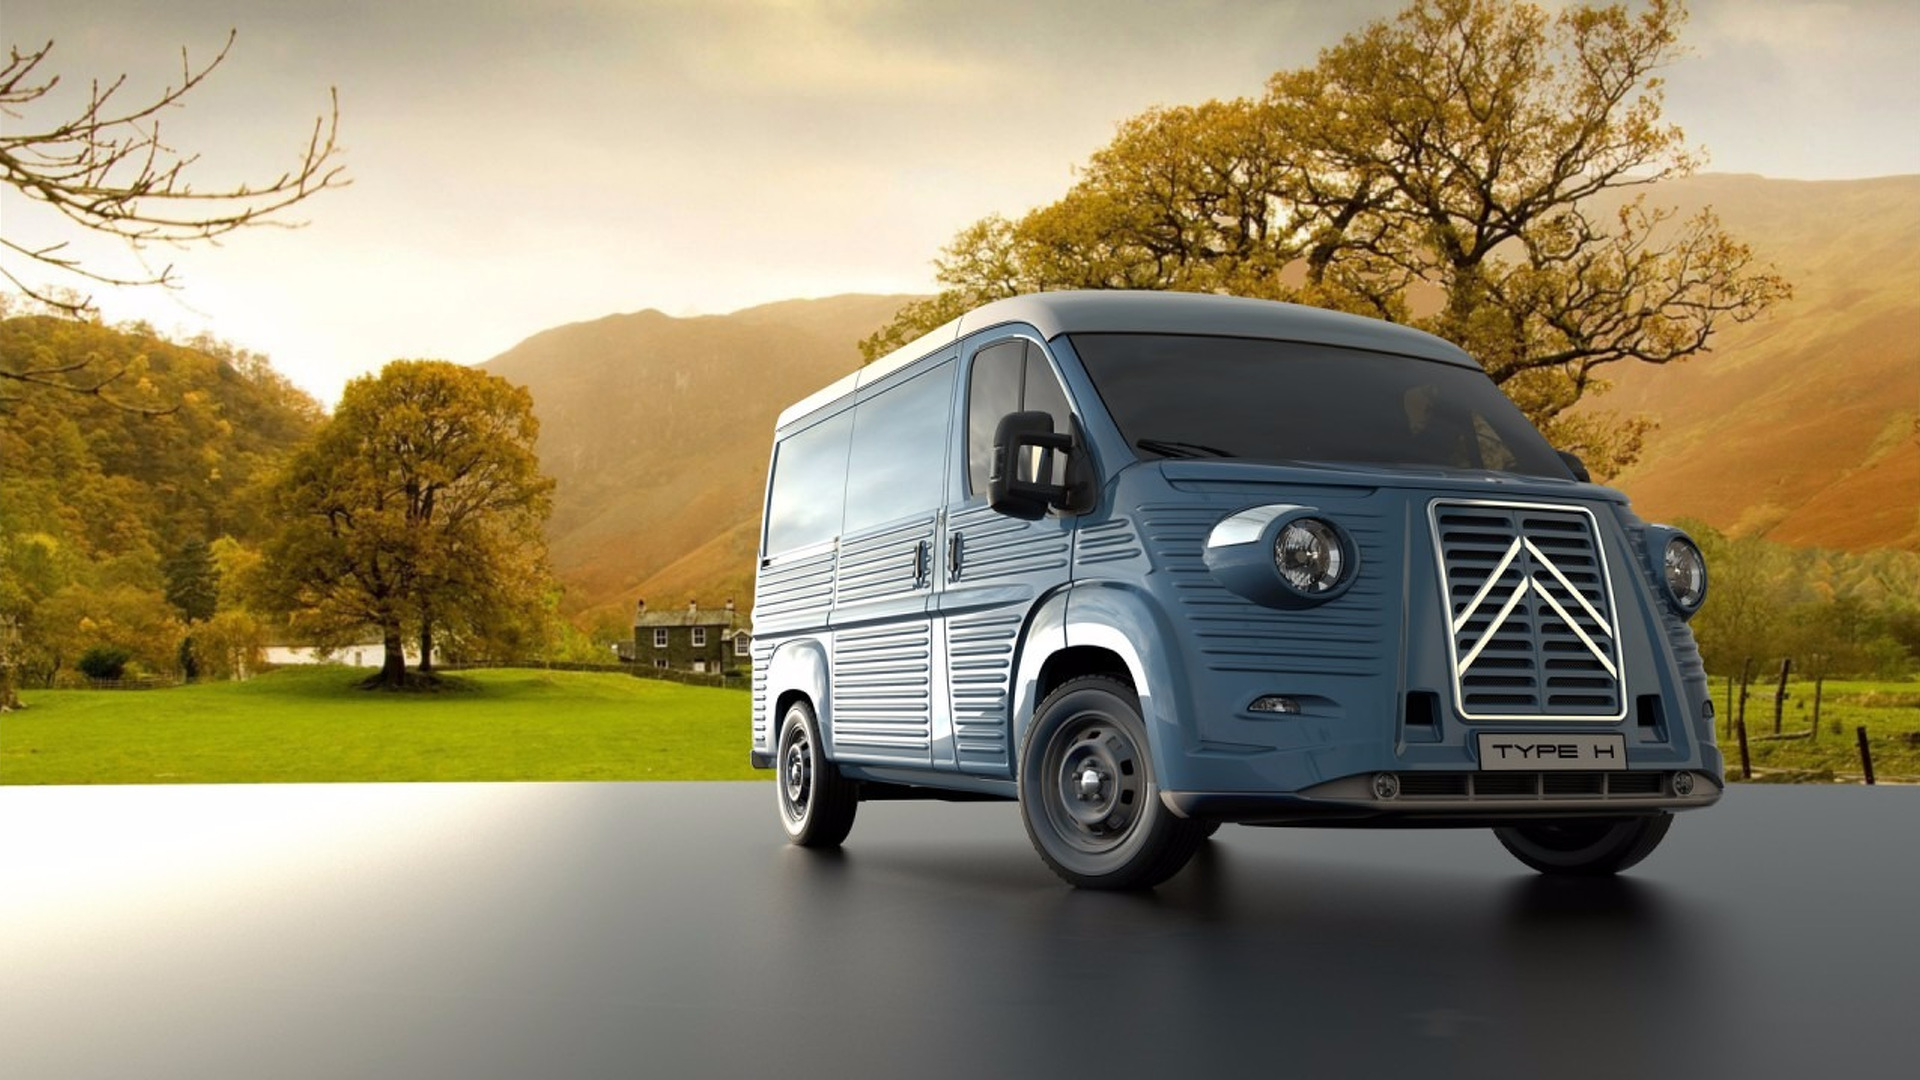 Body Kit Transforms New Citroen Jumper Into A Classic Type H Van